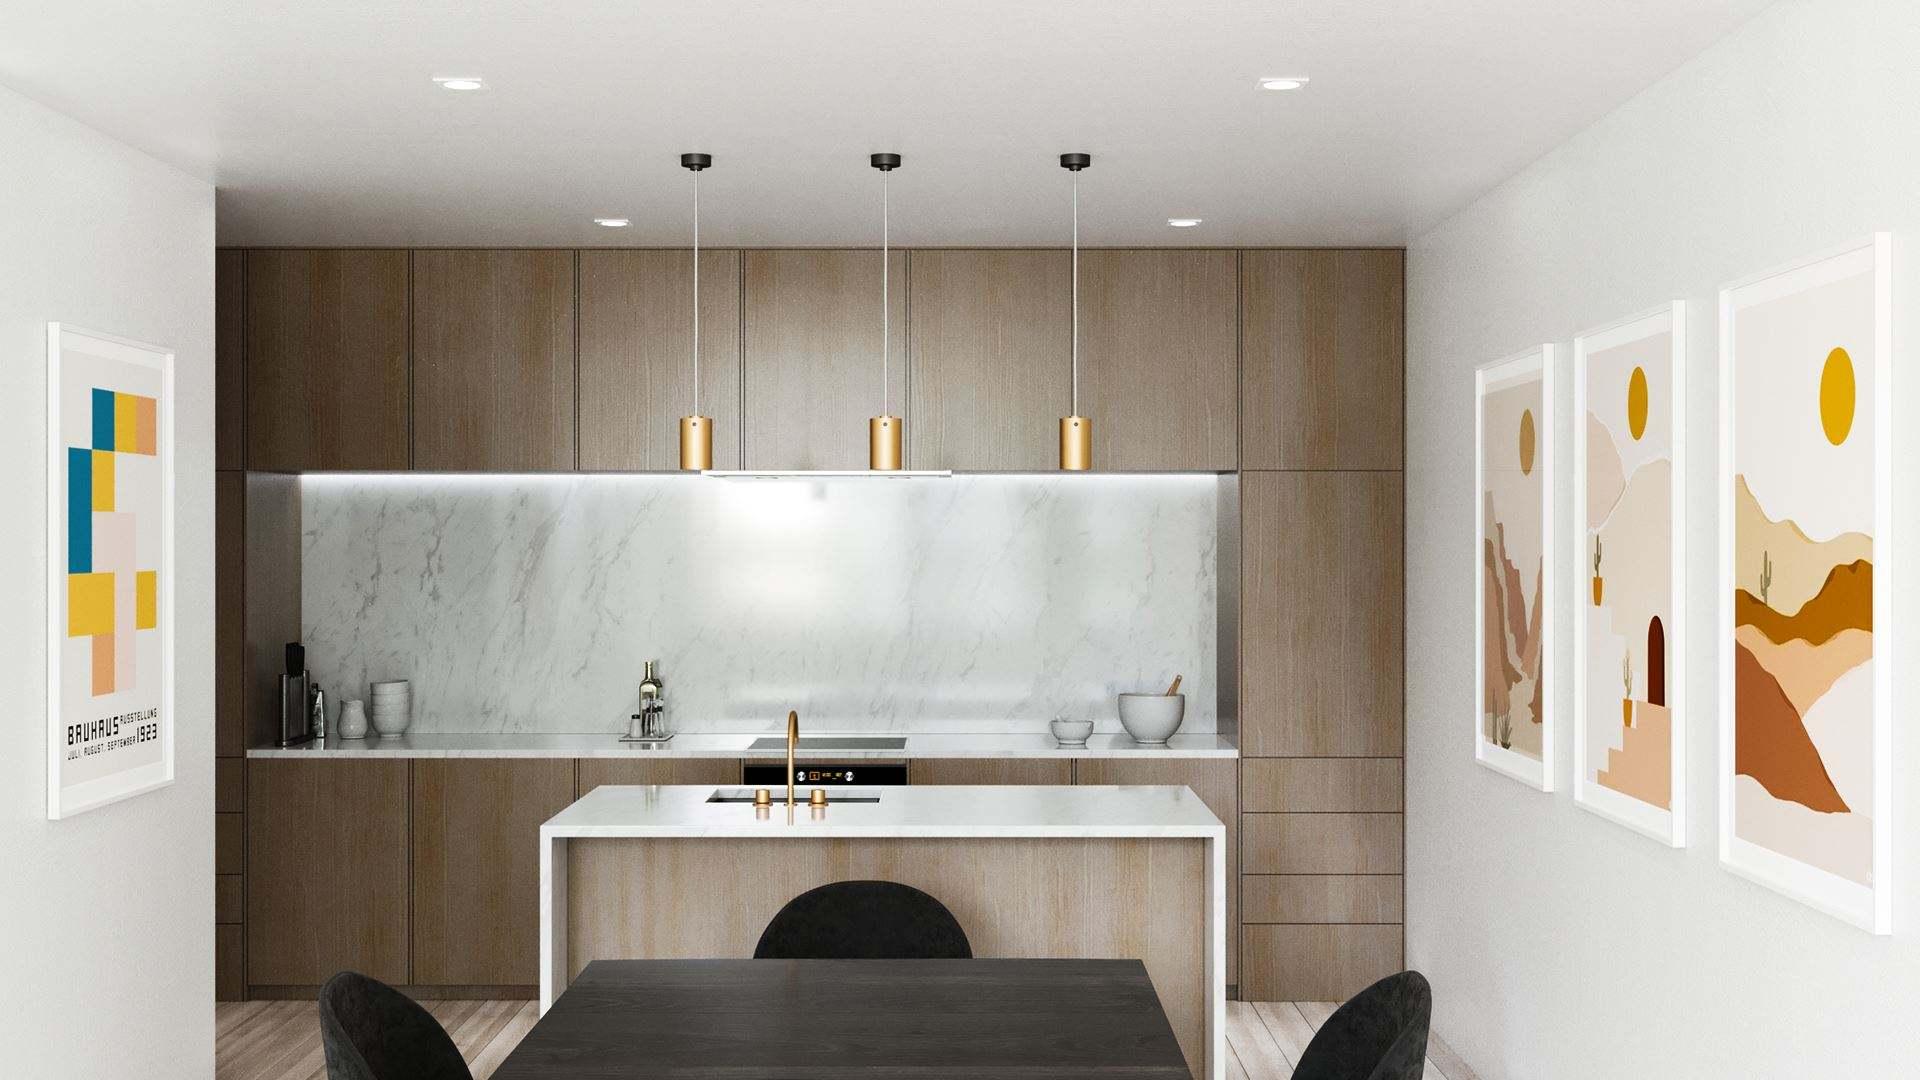 Milford 3房 Milford 110公寓 品质的象征 与湖海为伴 生活至臻至美 资源许可在手 即将动工! Luxury Living - Construction Starting Jan 2021